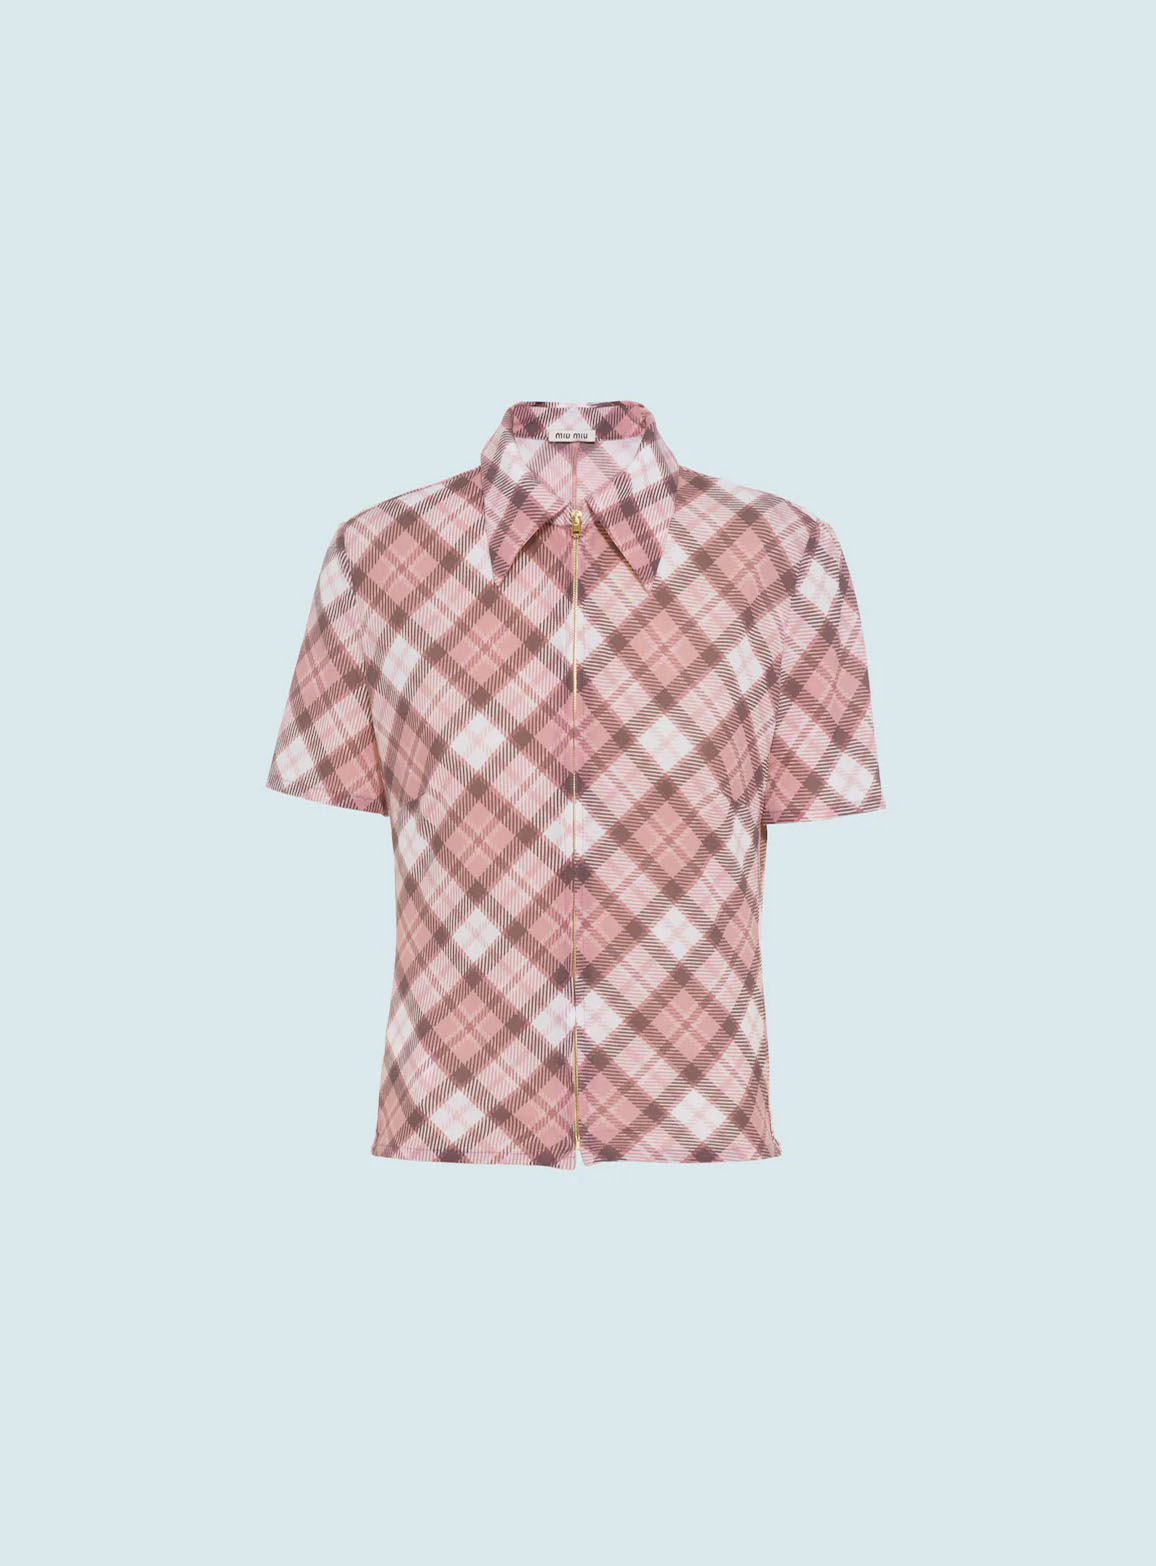 Printed run-proof knit shirt